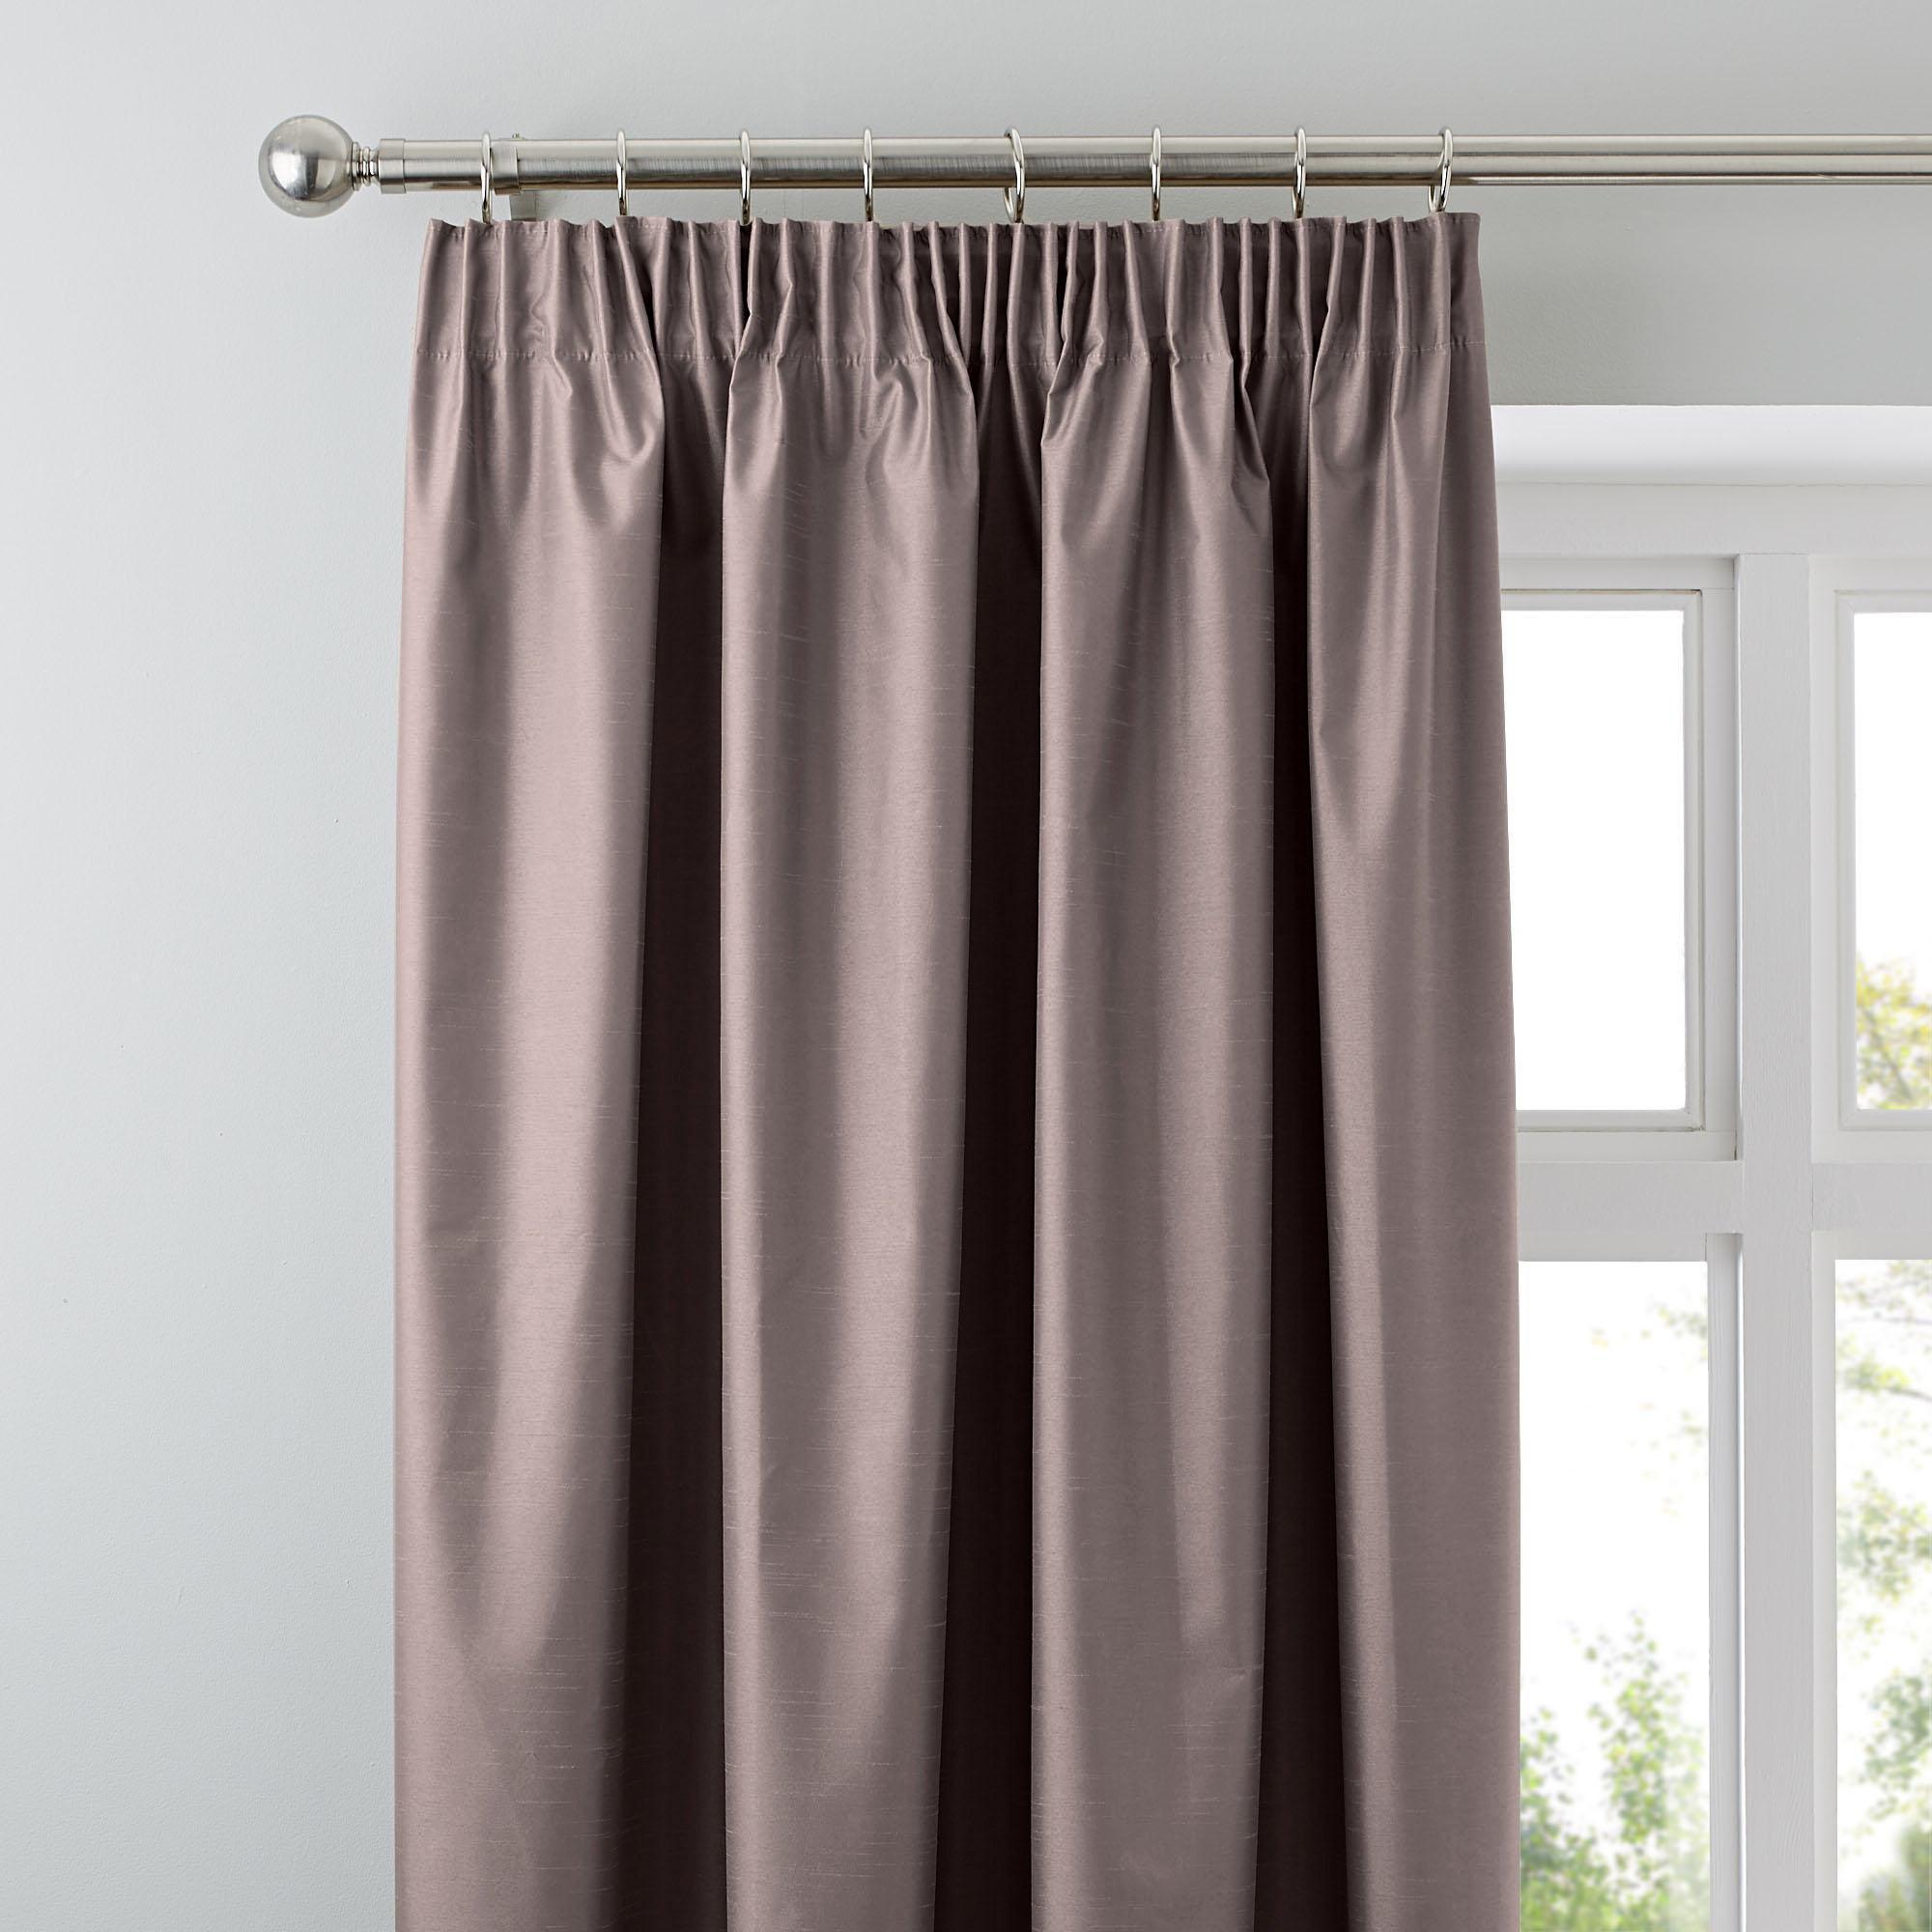 Photo of Nova gold blackout pencil pleat curtains copper brown